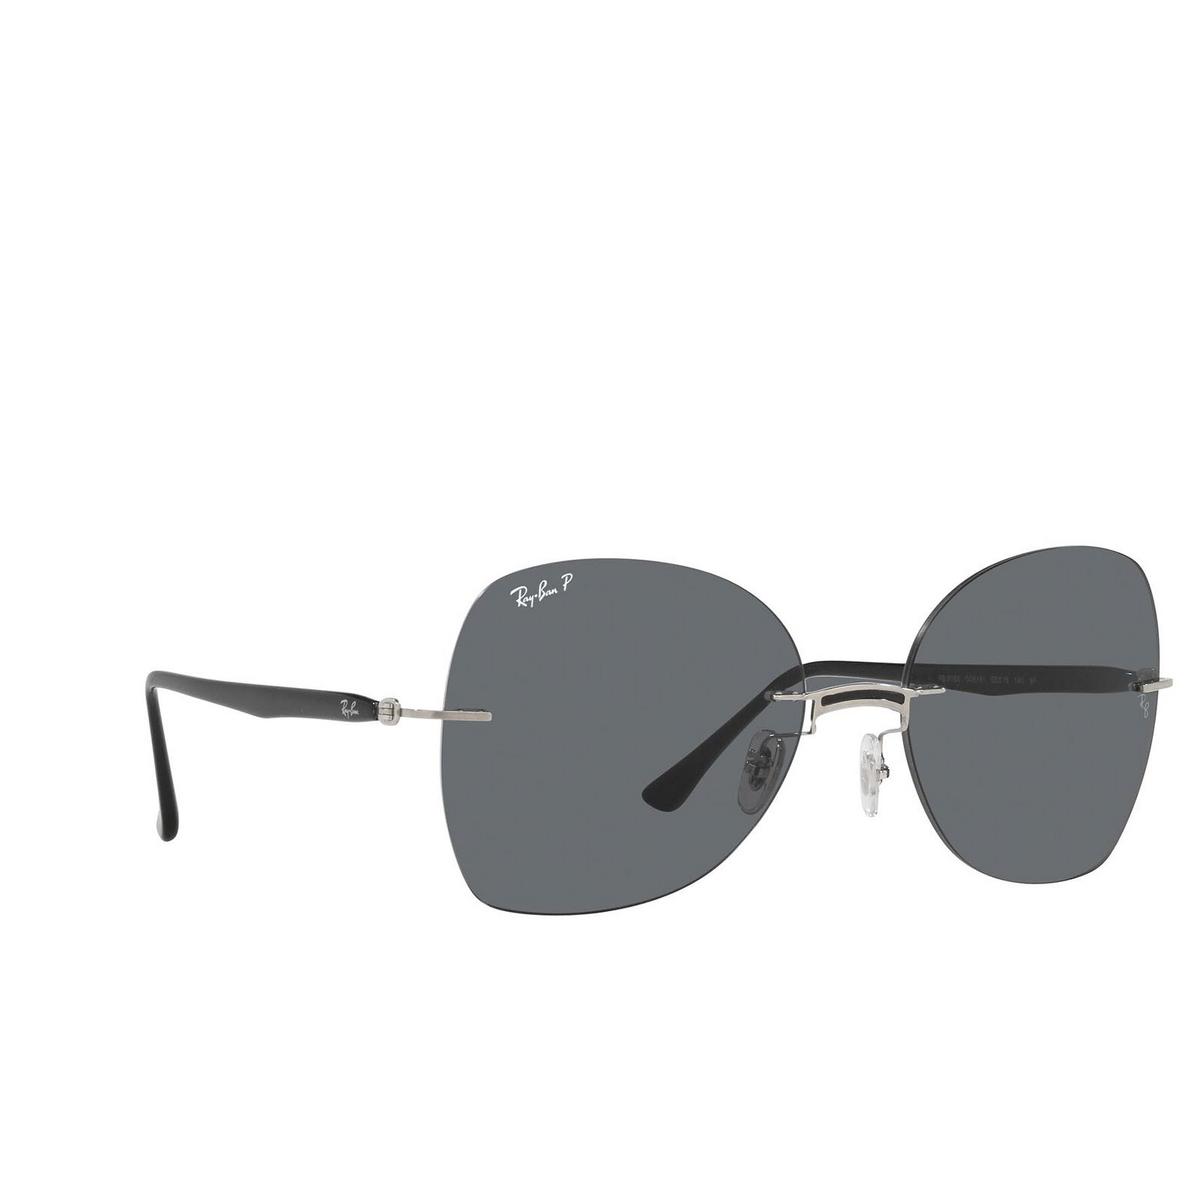 Ray-Ban® Irregular Sunglasses: RB8066 color Black On Silver 003/81.